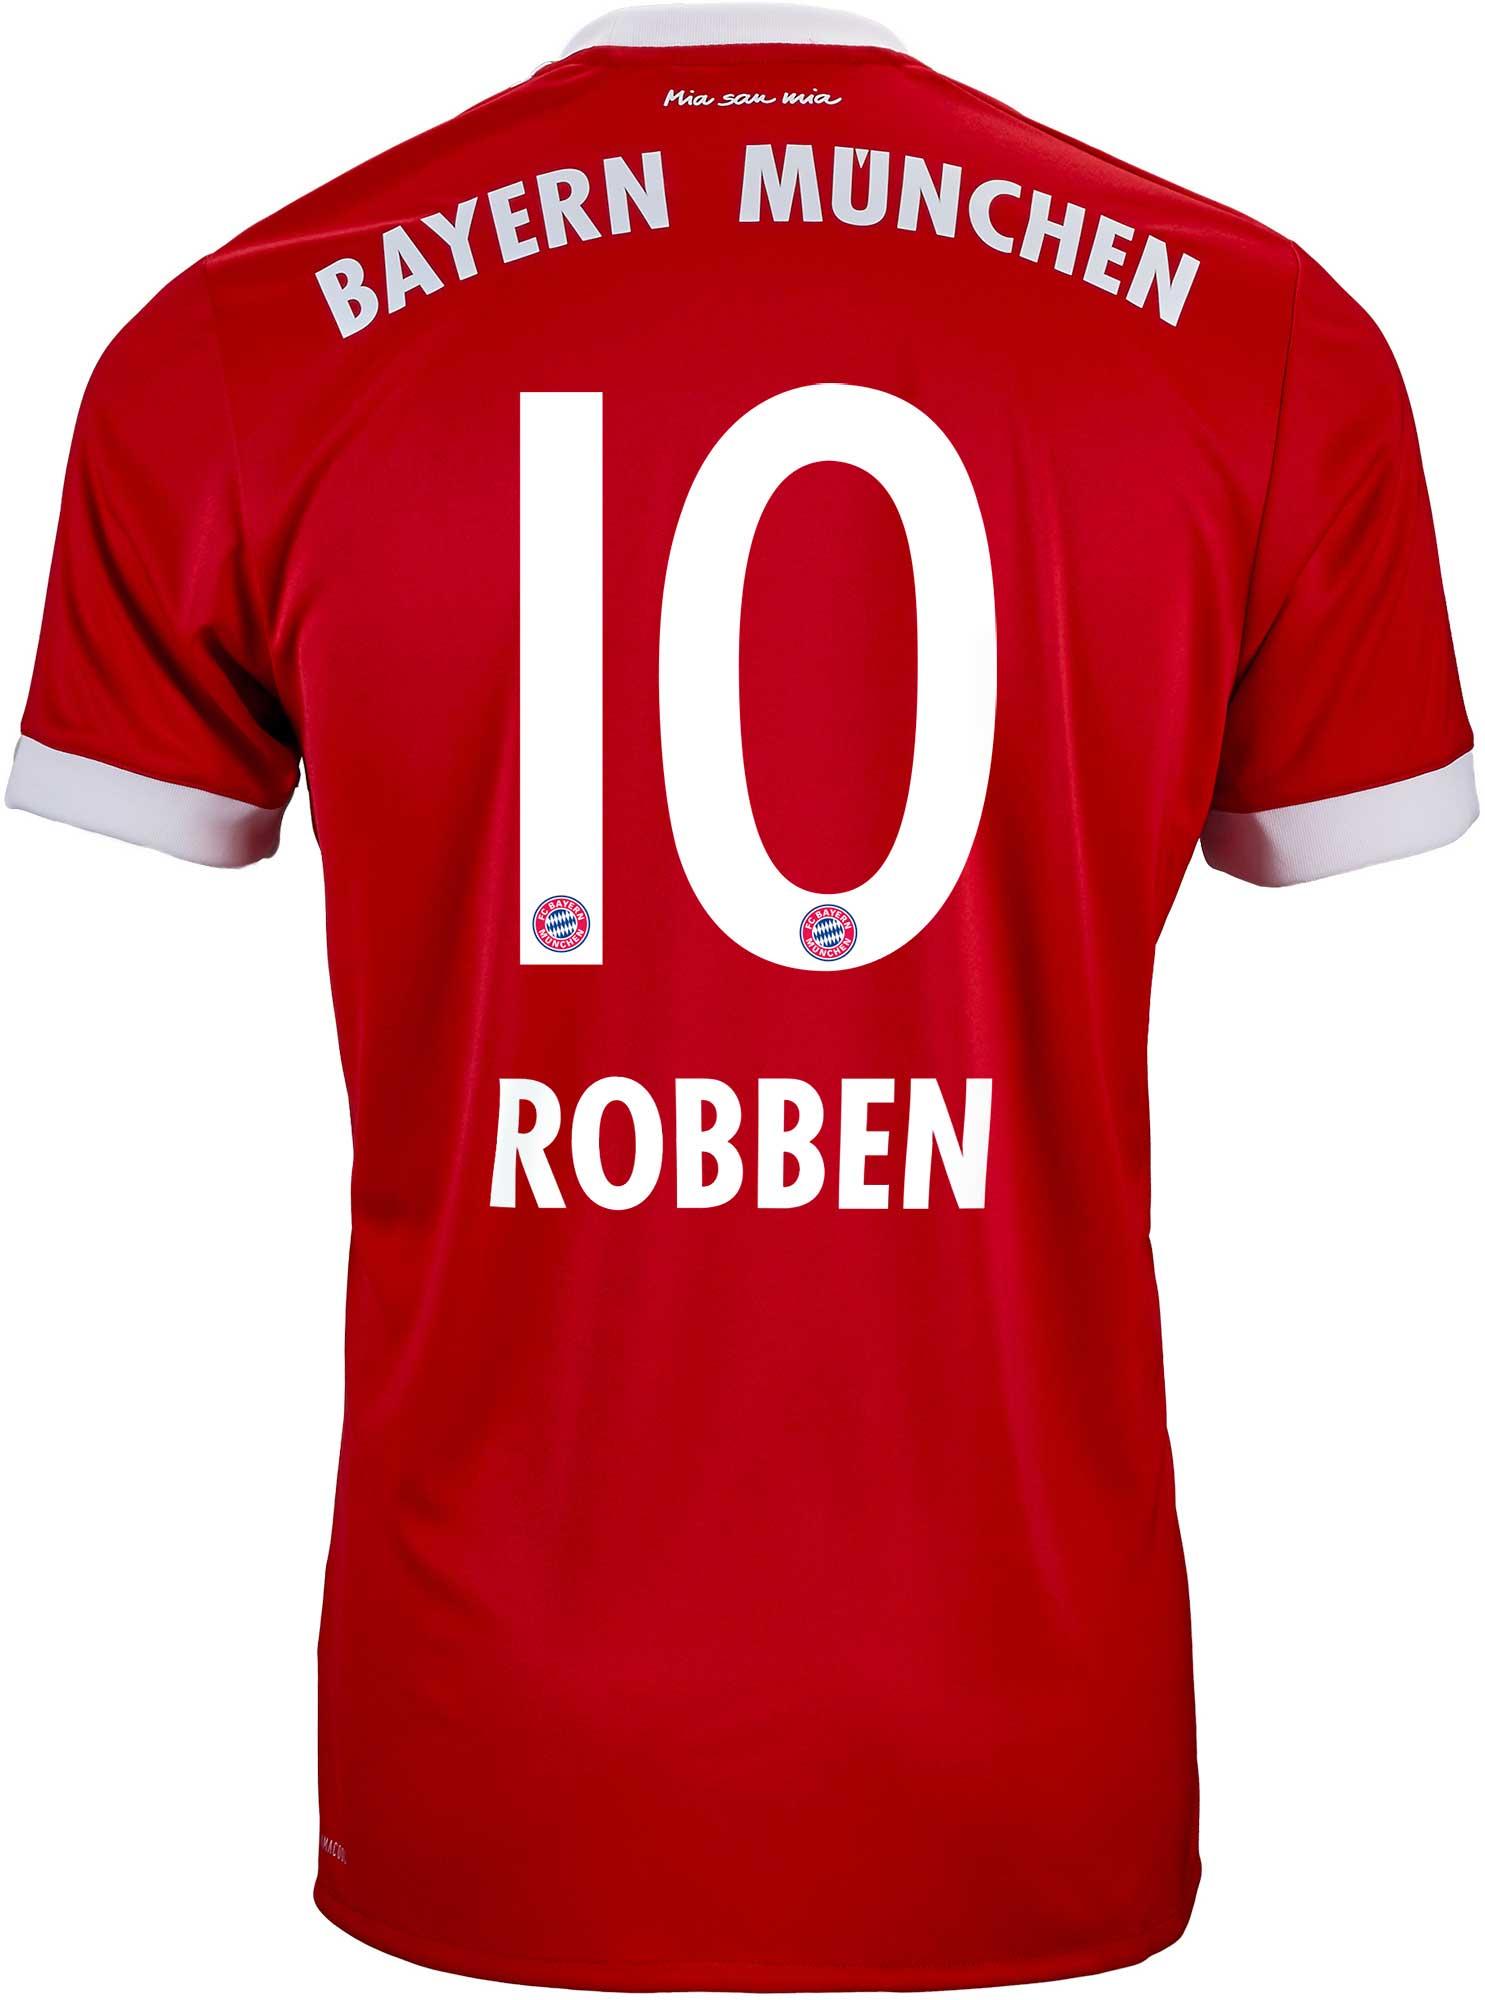 8c4a50931 2017/18 adidas Arjen Robben Bayern Munich Home Jersey